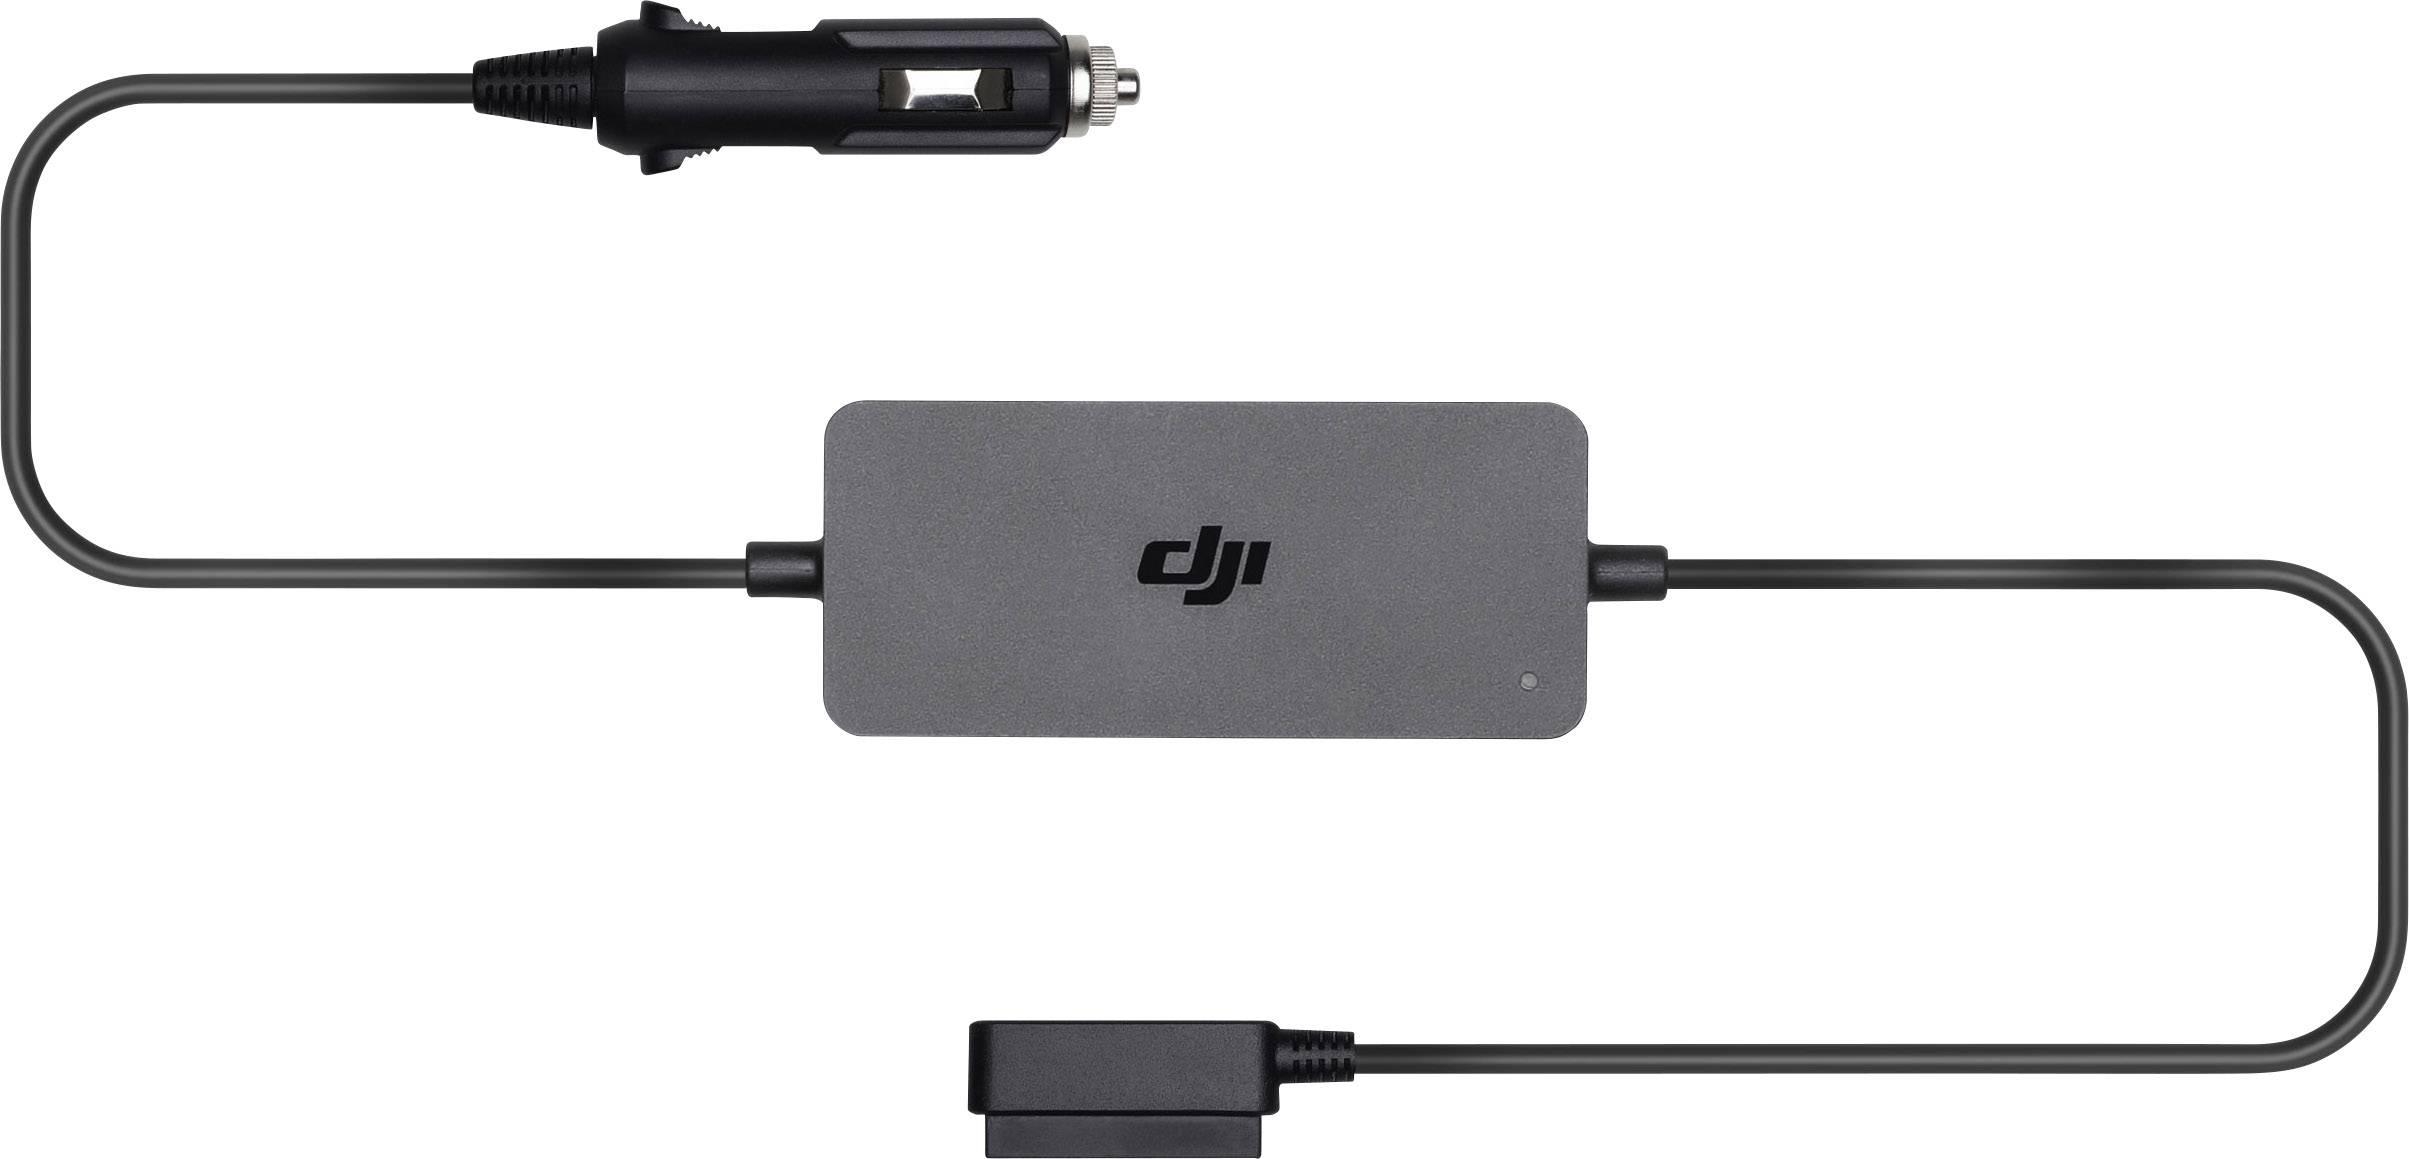 e068bb9539 Chargeur de multicoptère 12V DJI Part 4 1 pc(s) | Conrad.fr